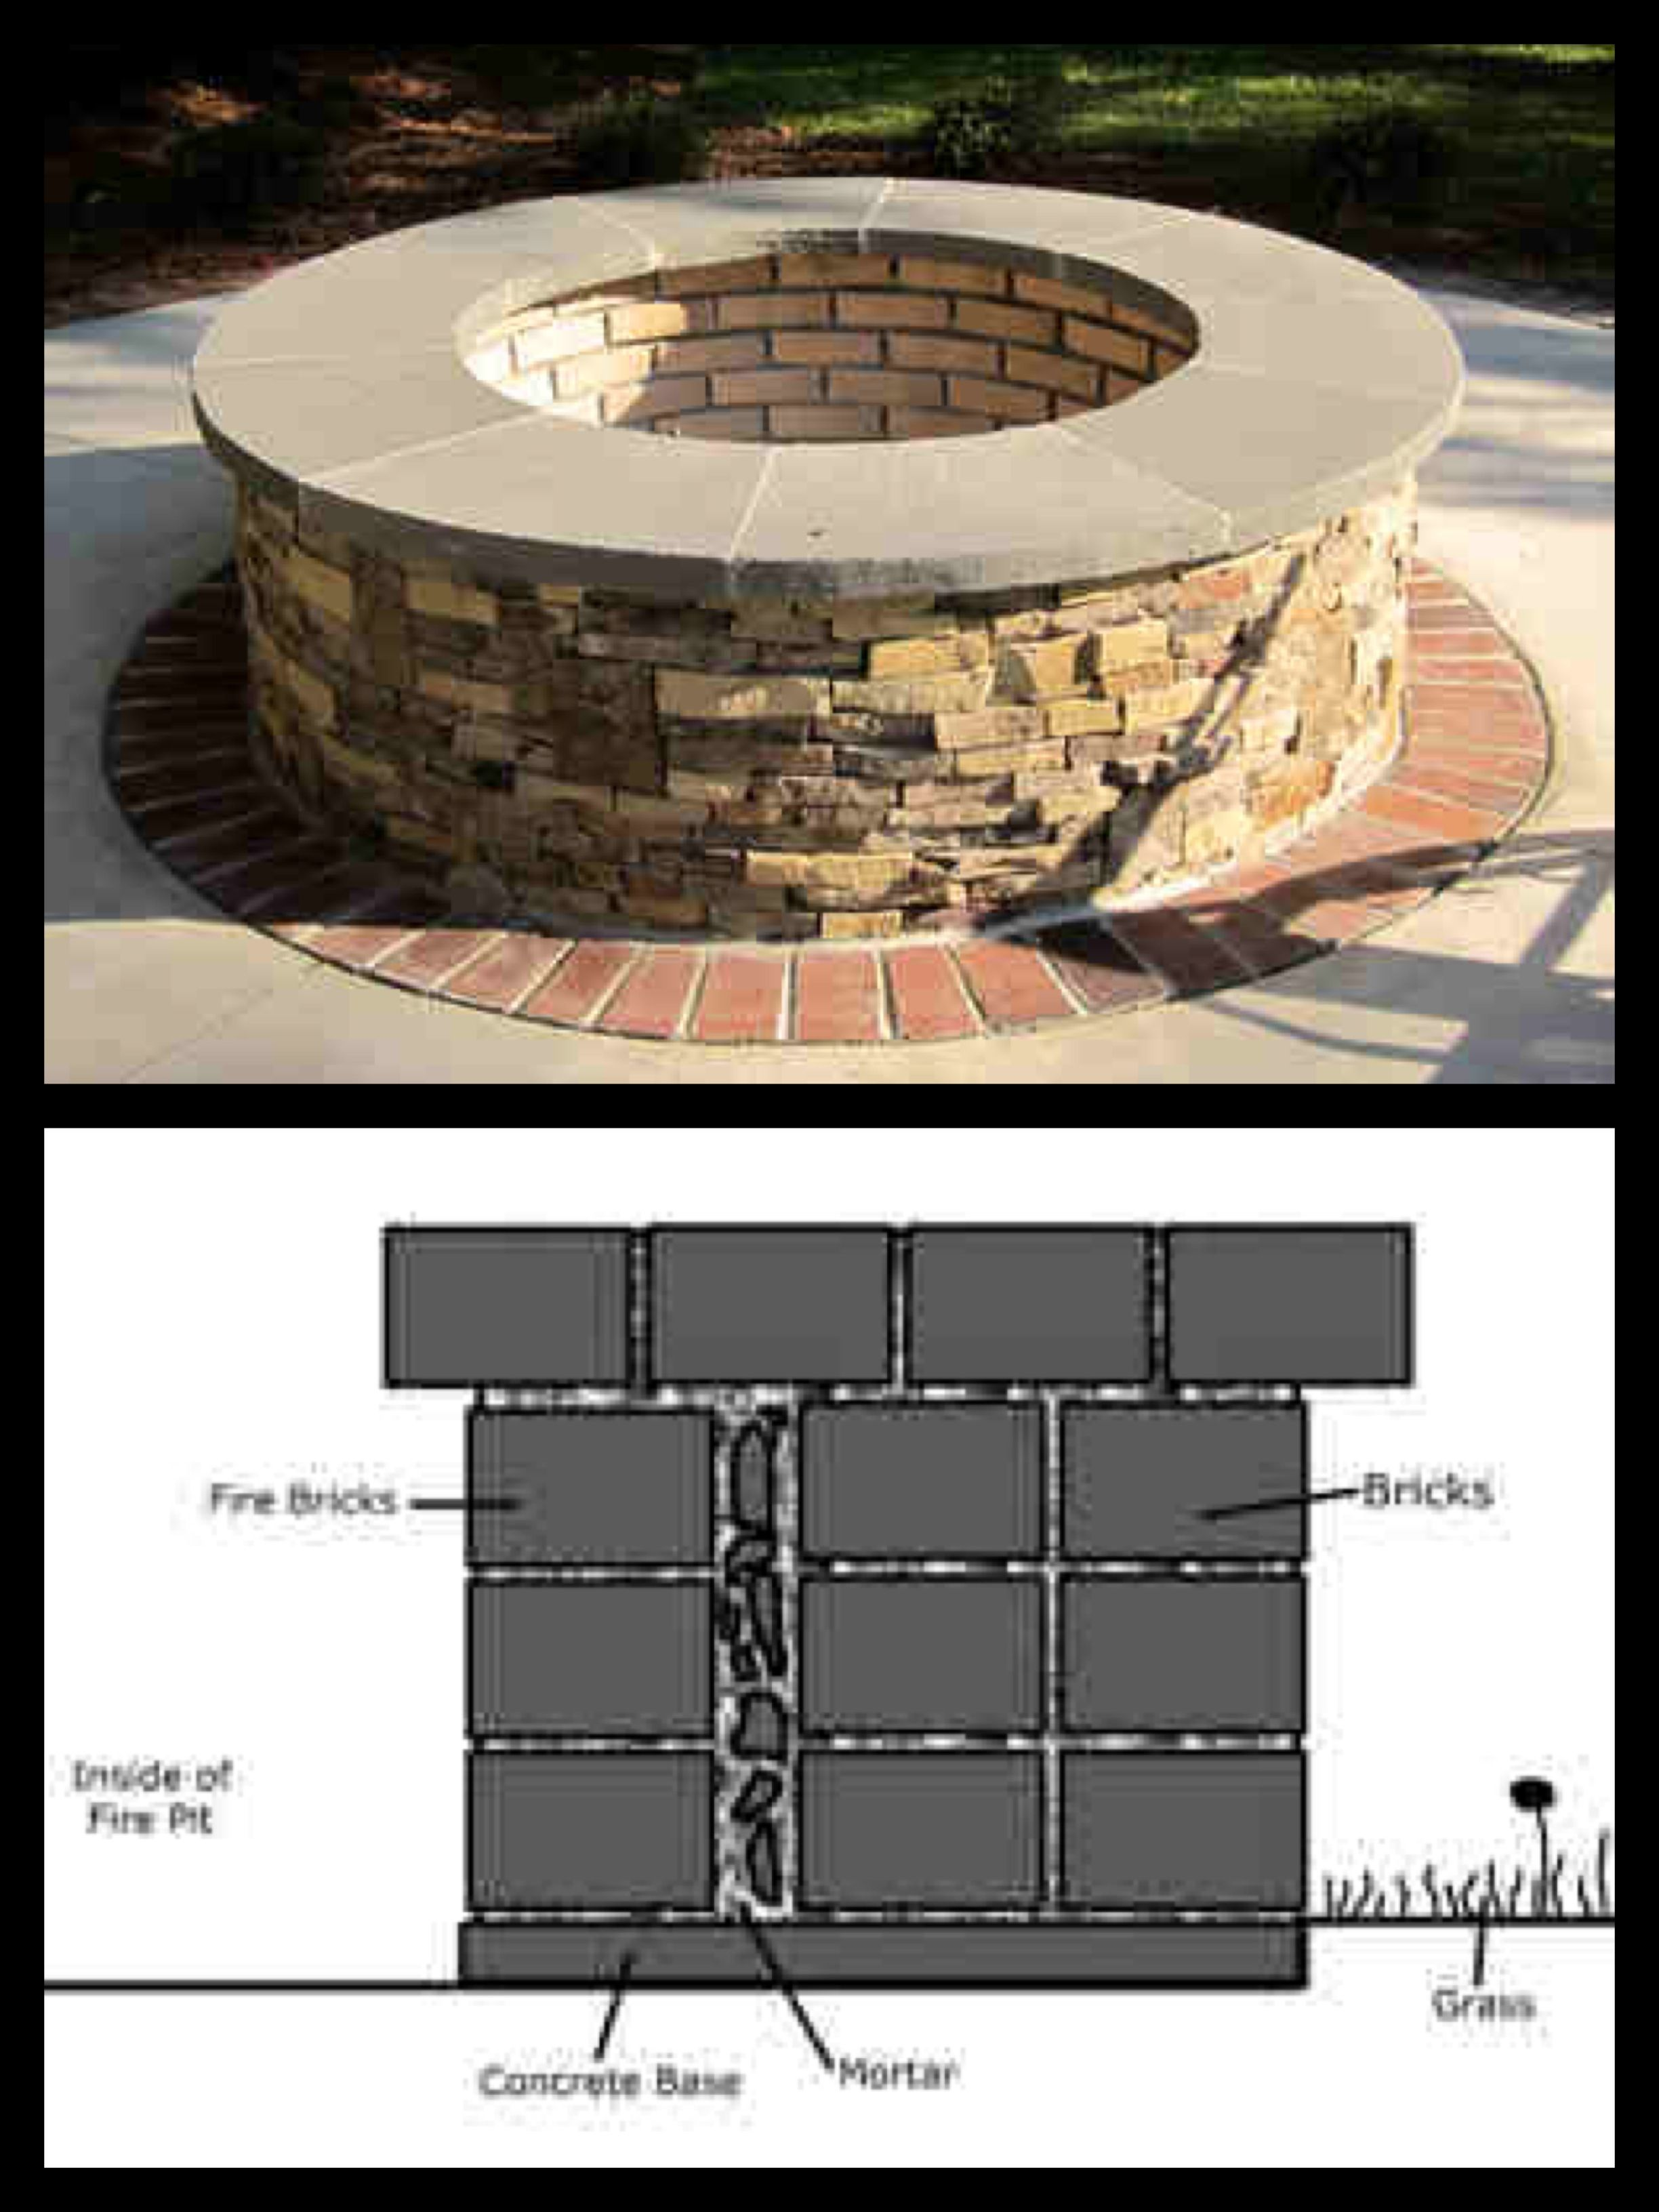 unique image of fire pit bricks furniture designs furniture